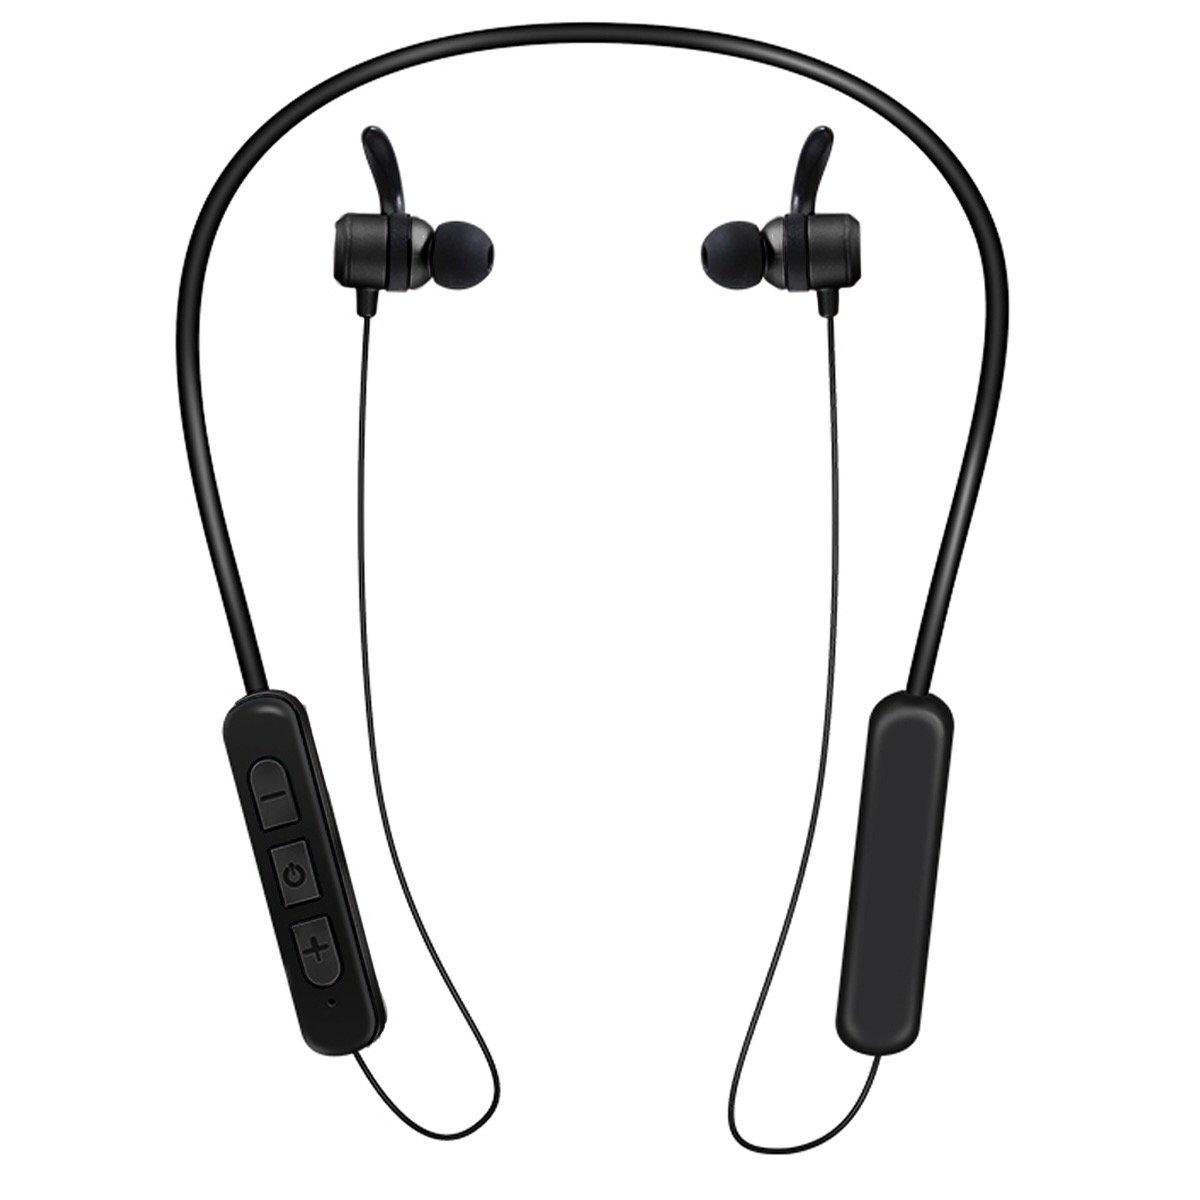 Bluetooth Headphones, Wireless V4.2 Magnetic Earphones, Sweatproof Sports Stereo in Ear Earbuds with Noice Reduction CVC6.0 KDK58 (Black)